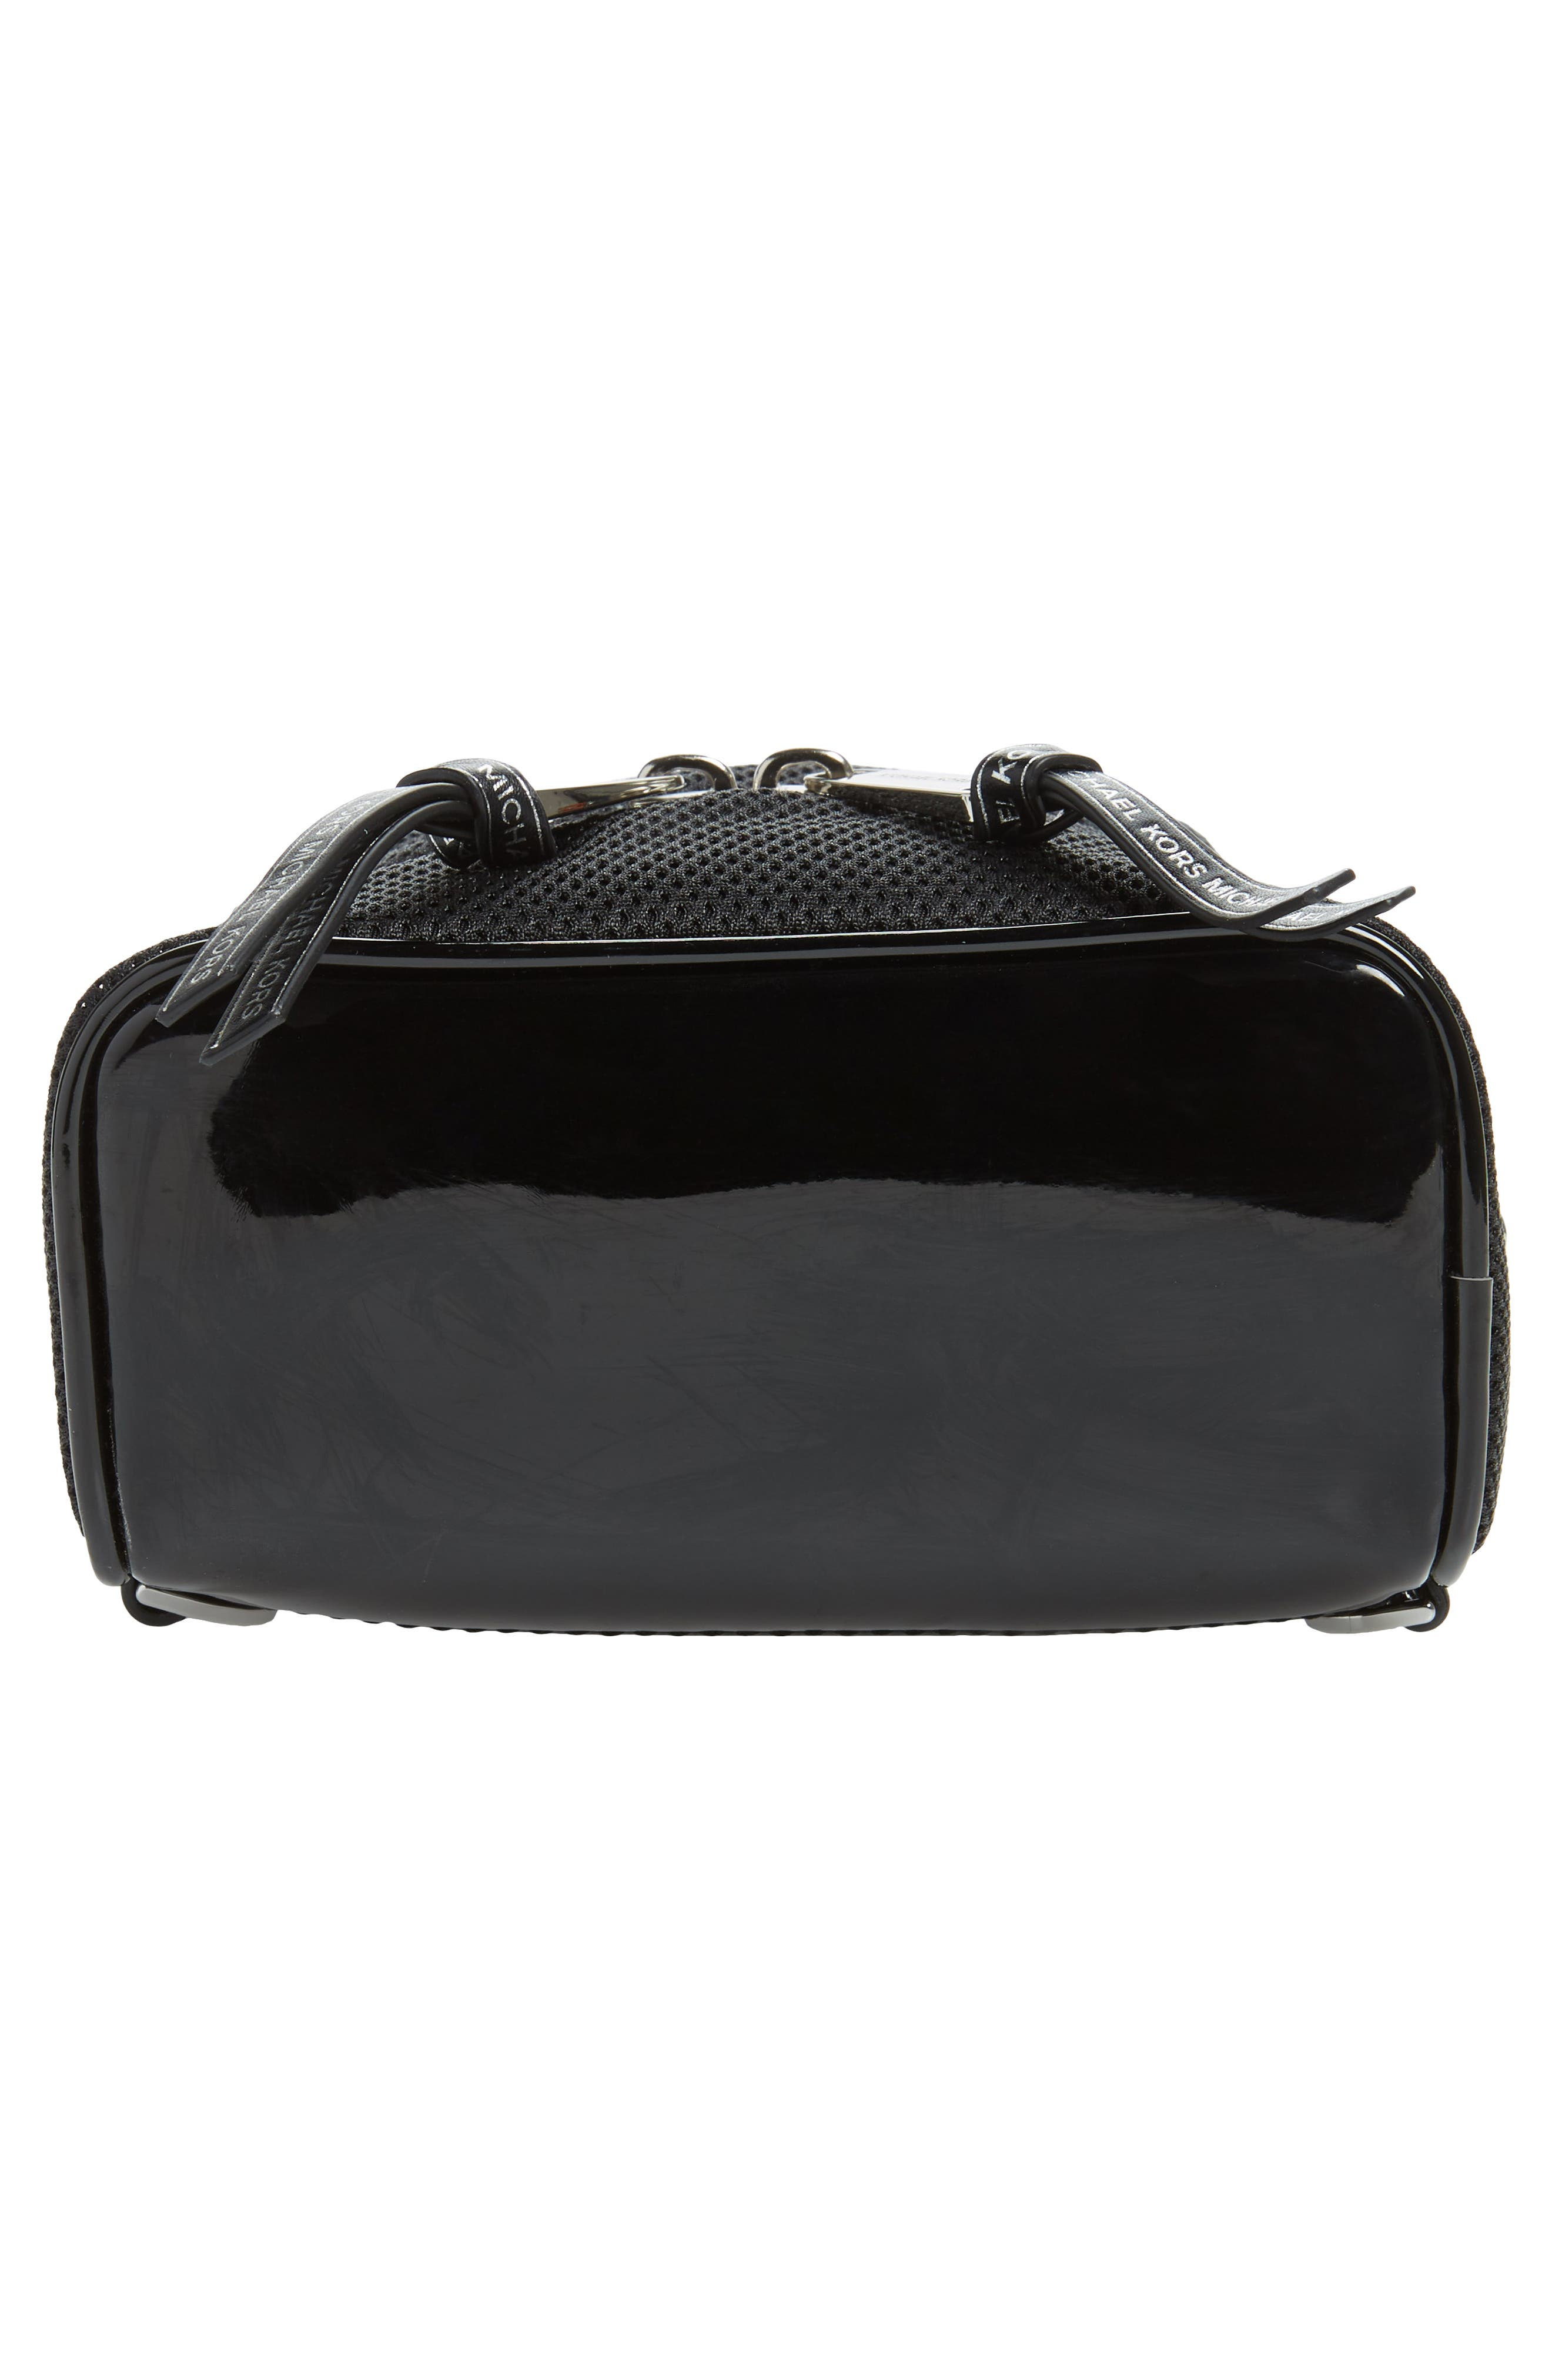 MICHAEL MICHAEL KORS, Extra Small Rhea Mesh Backpack, Alternate thumbnail 8, color, BLACK/ OPTIC WHITE